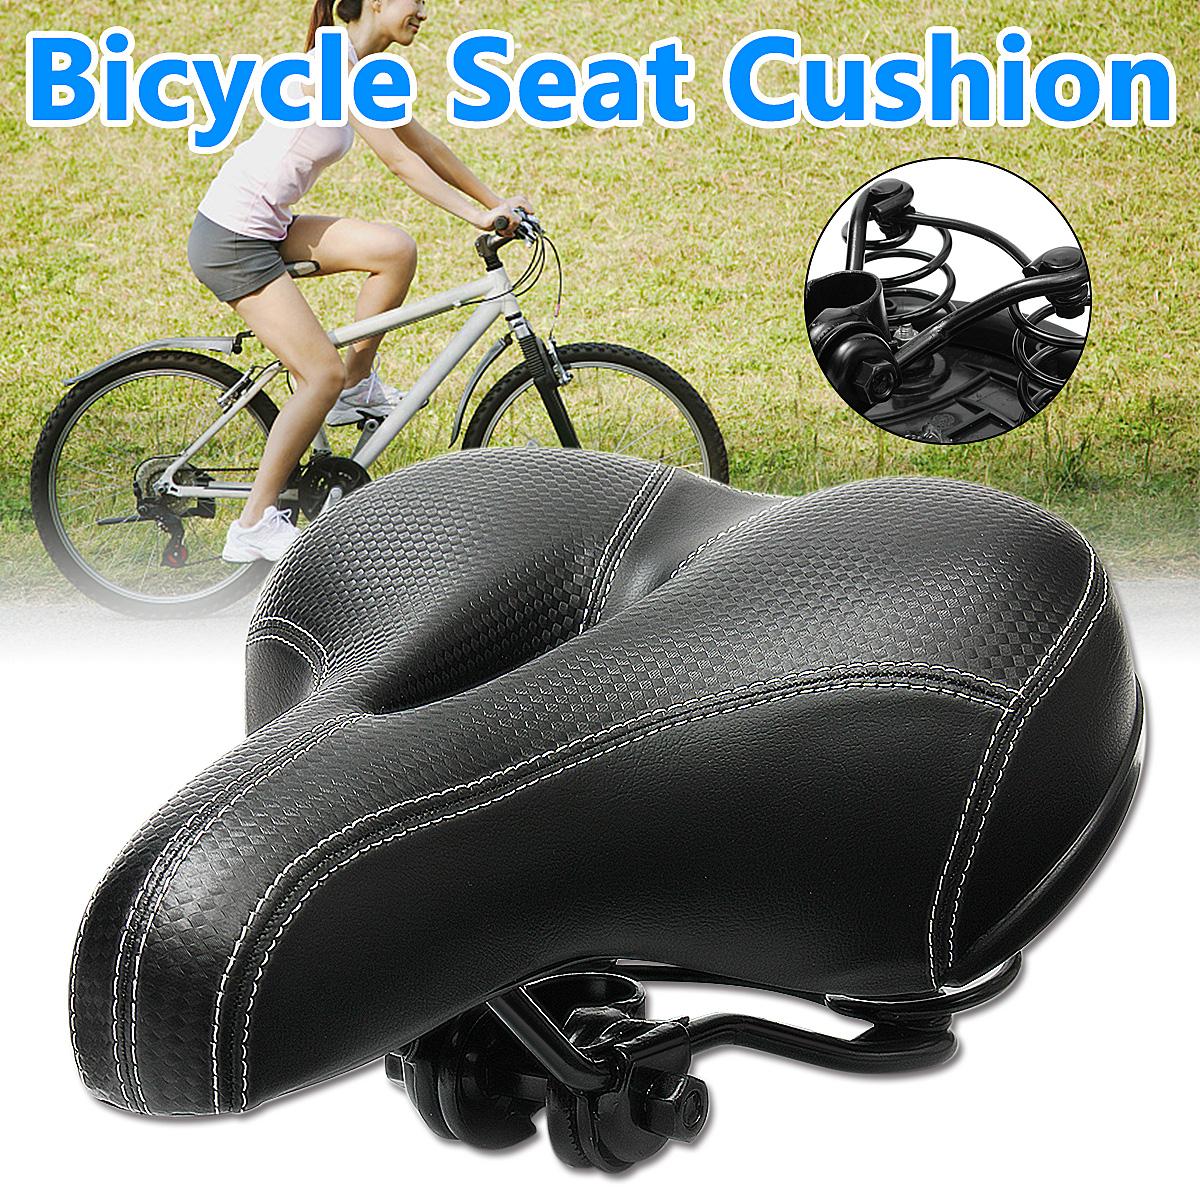 Saddle sprung black ladies unisex universal bike seat bicycle comfort cycle